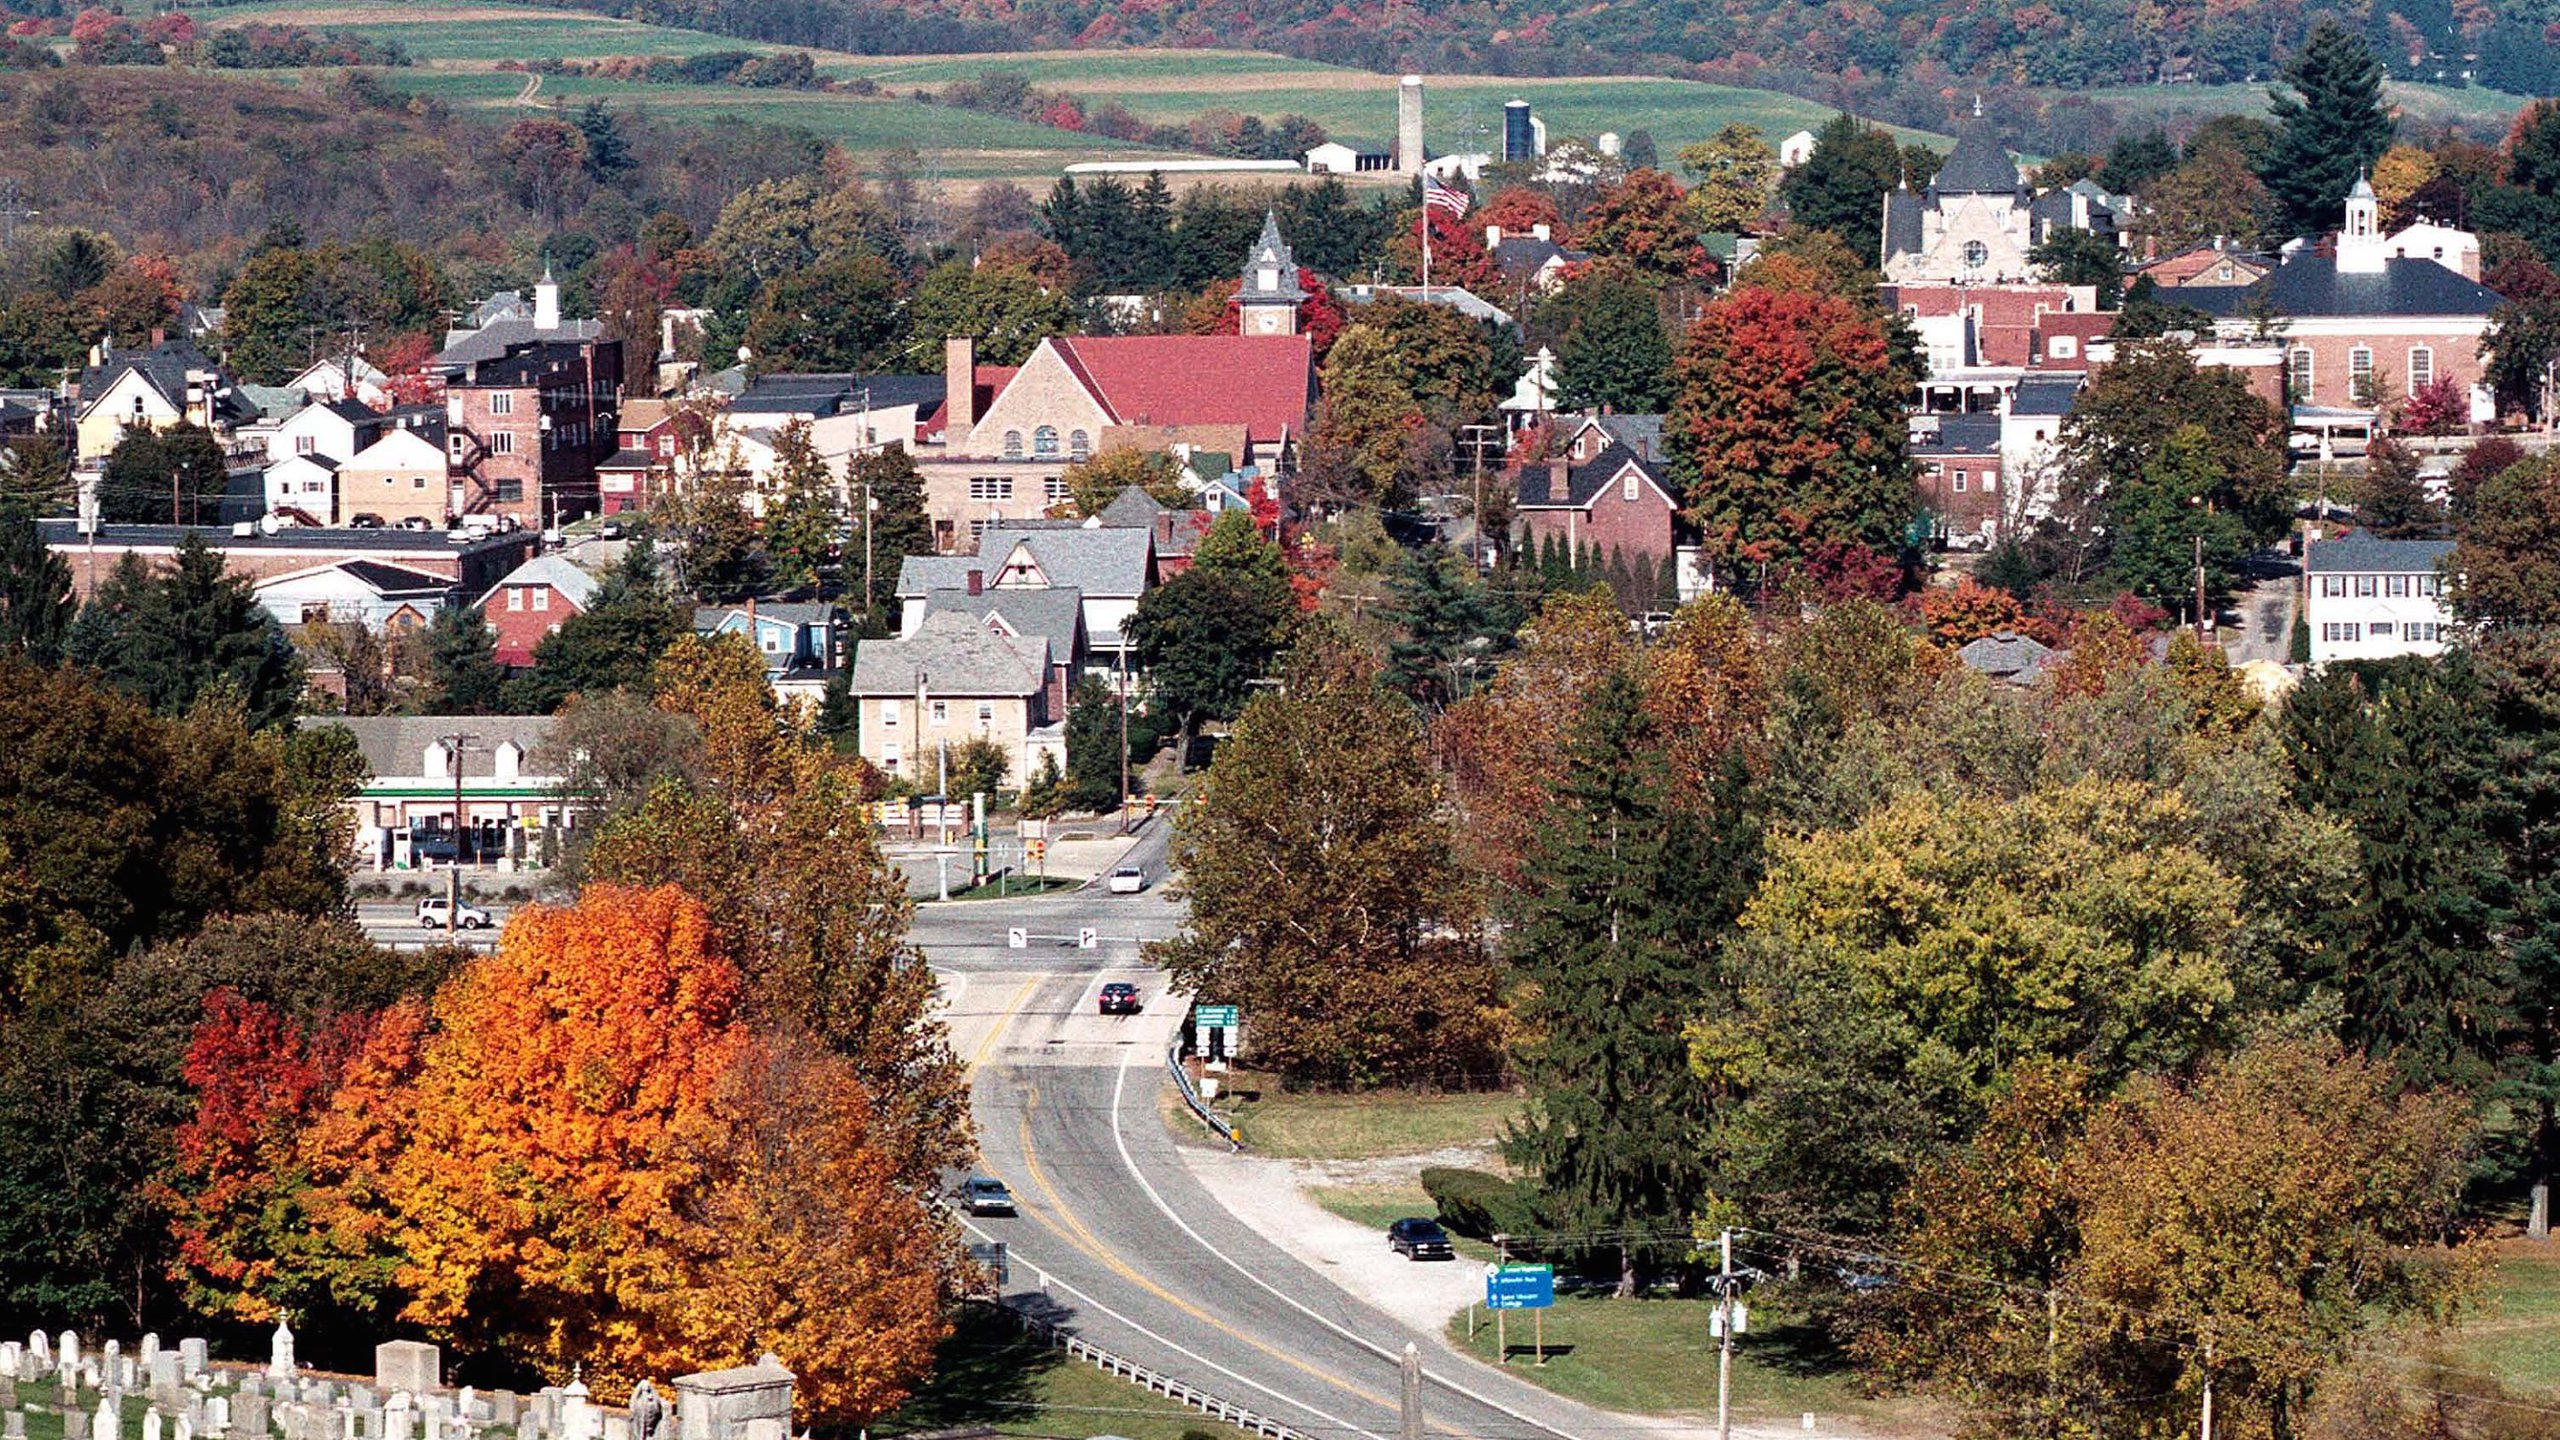 Ligonier, Pennsylvania, United States of America